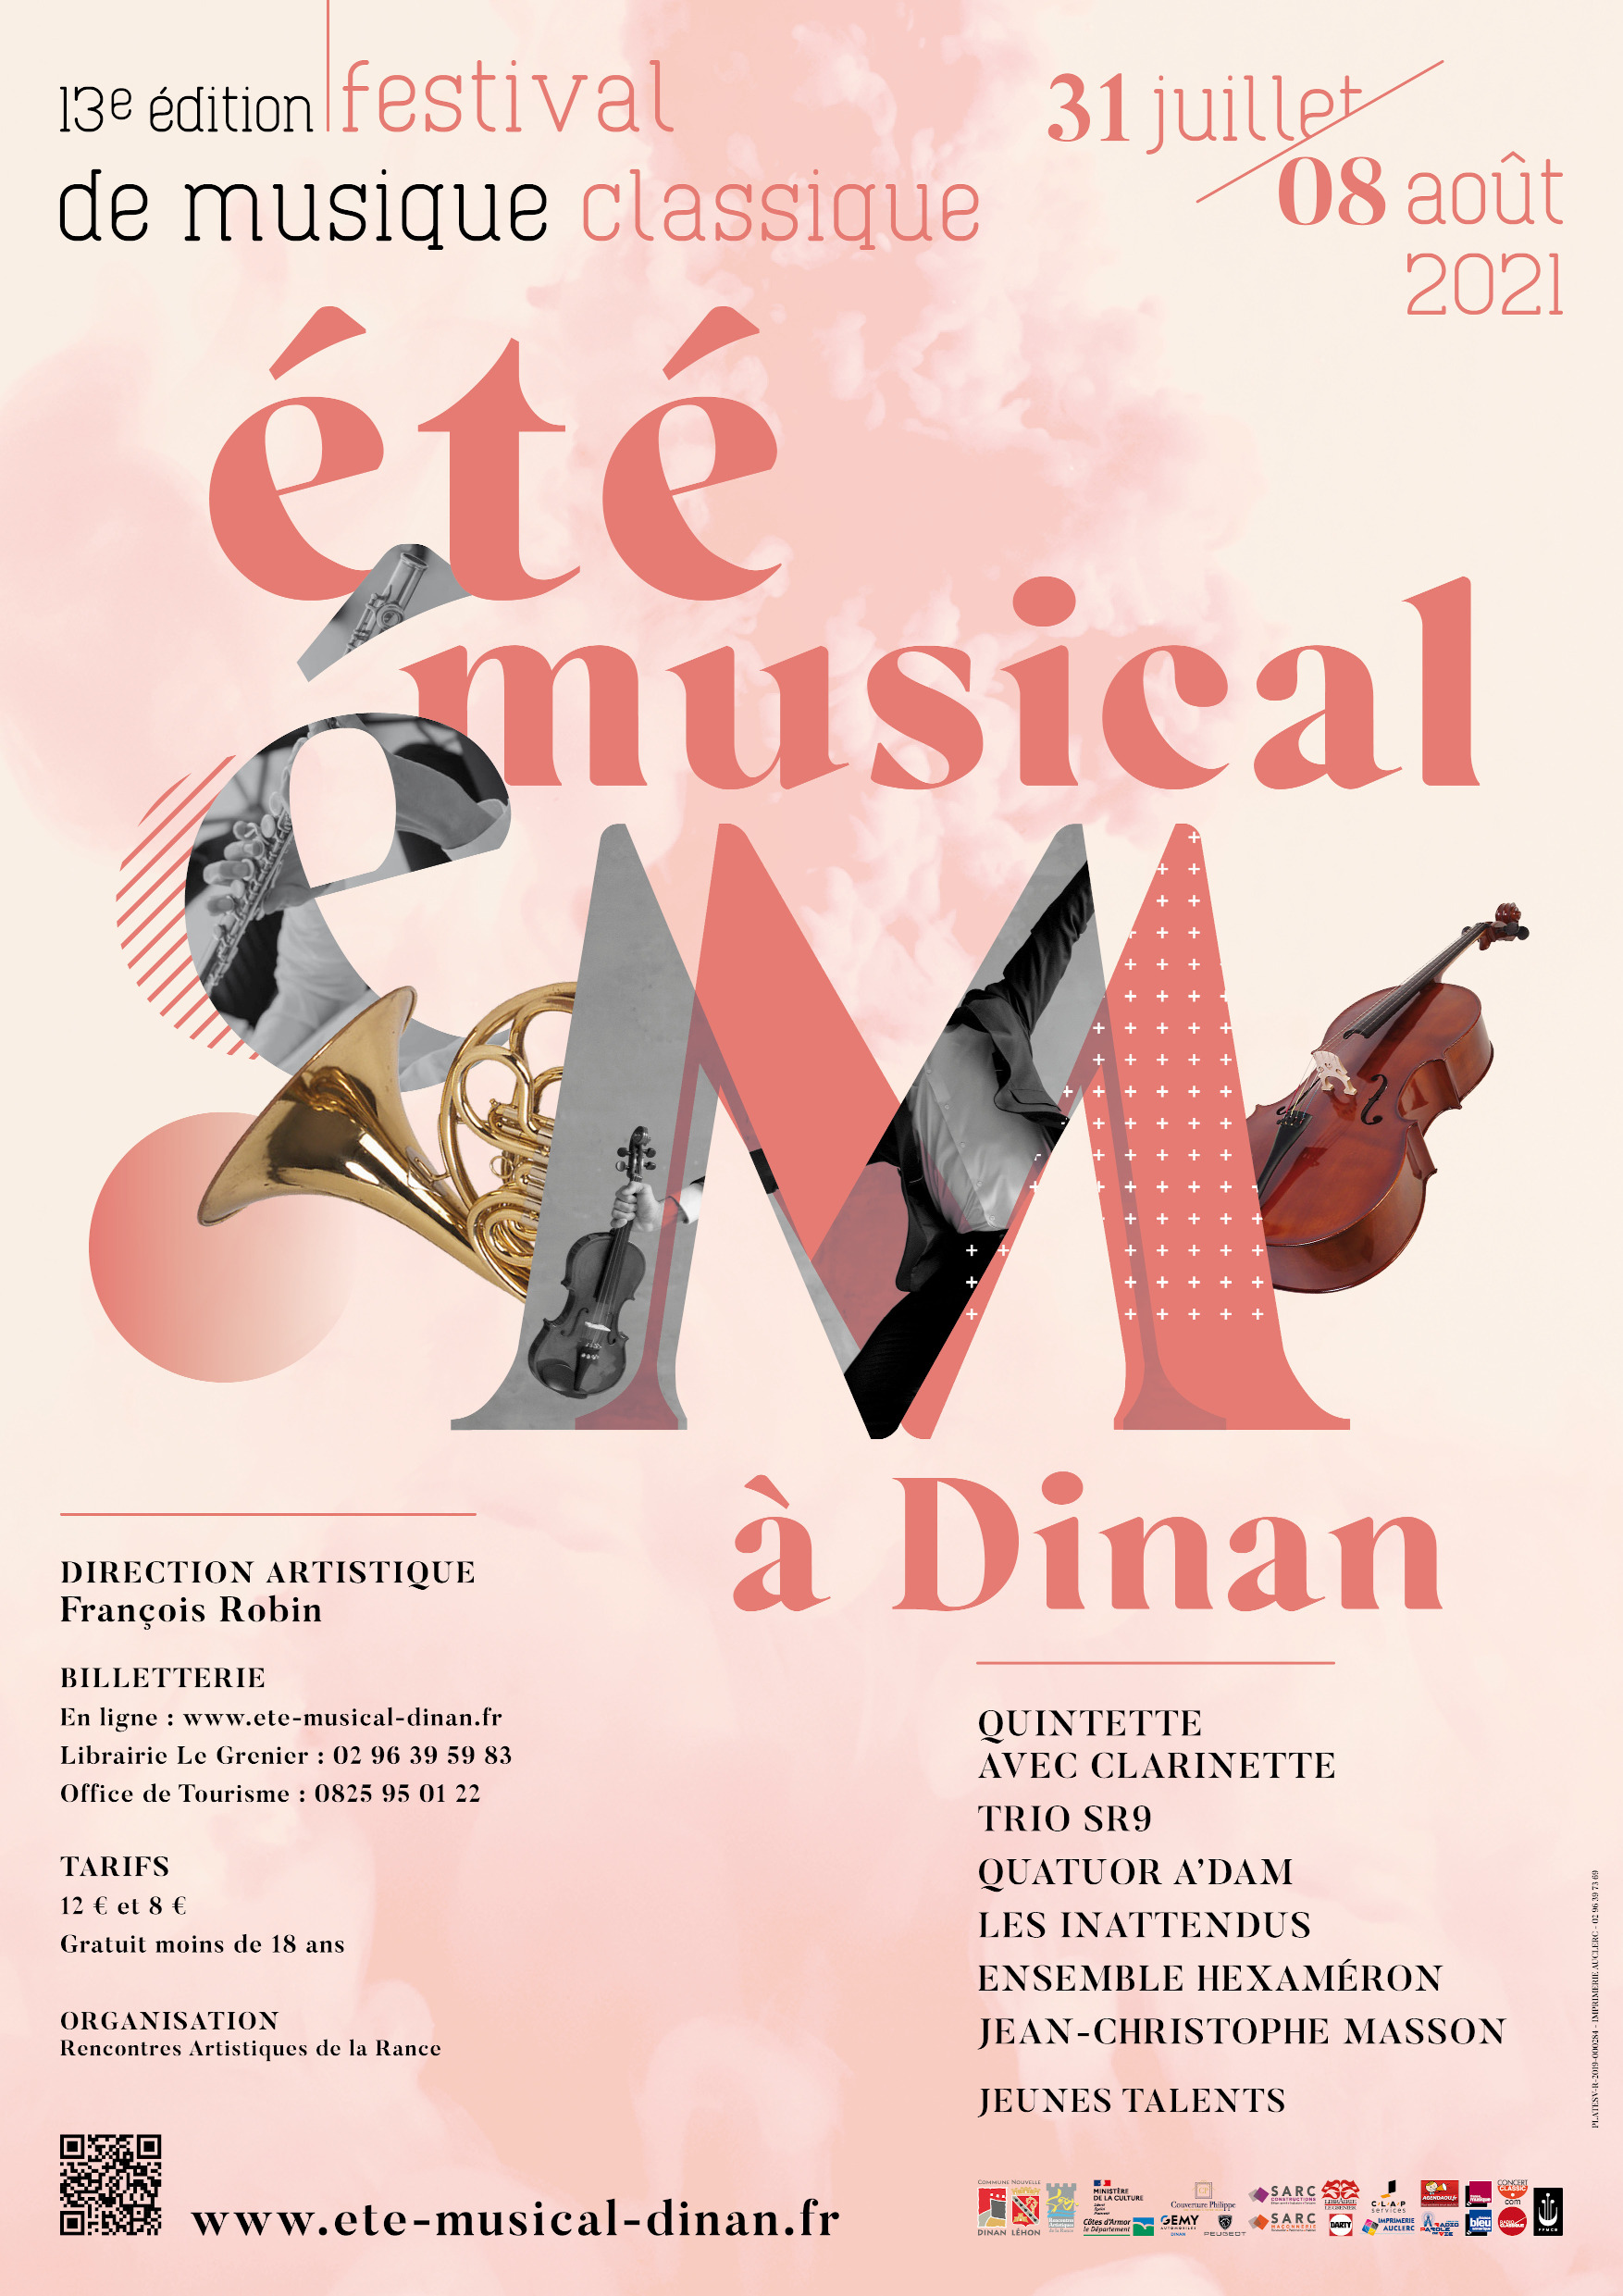 Eté musical à Dinan